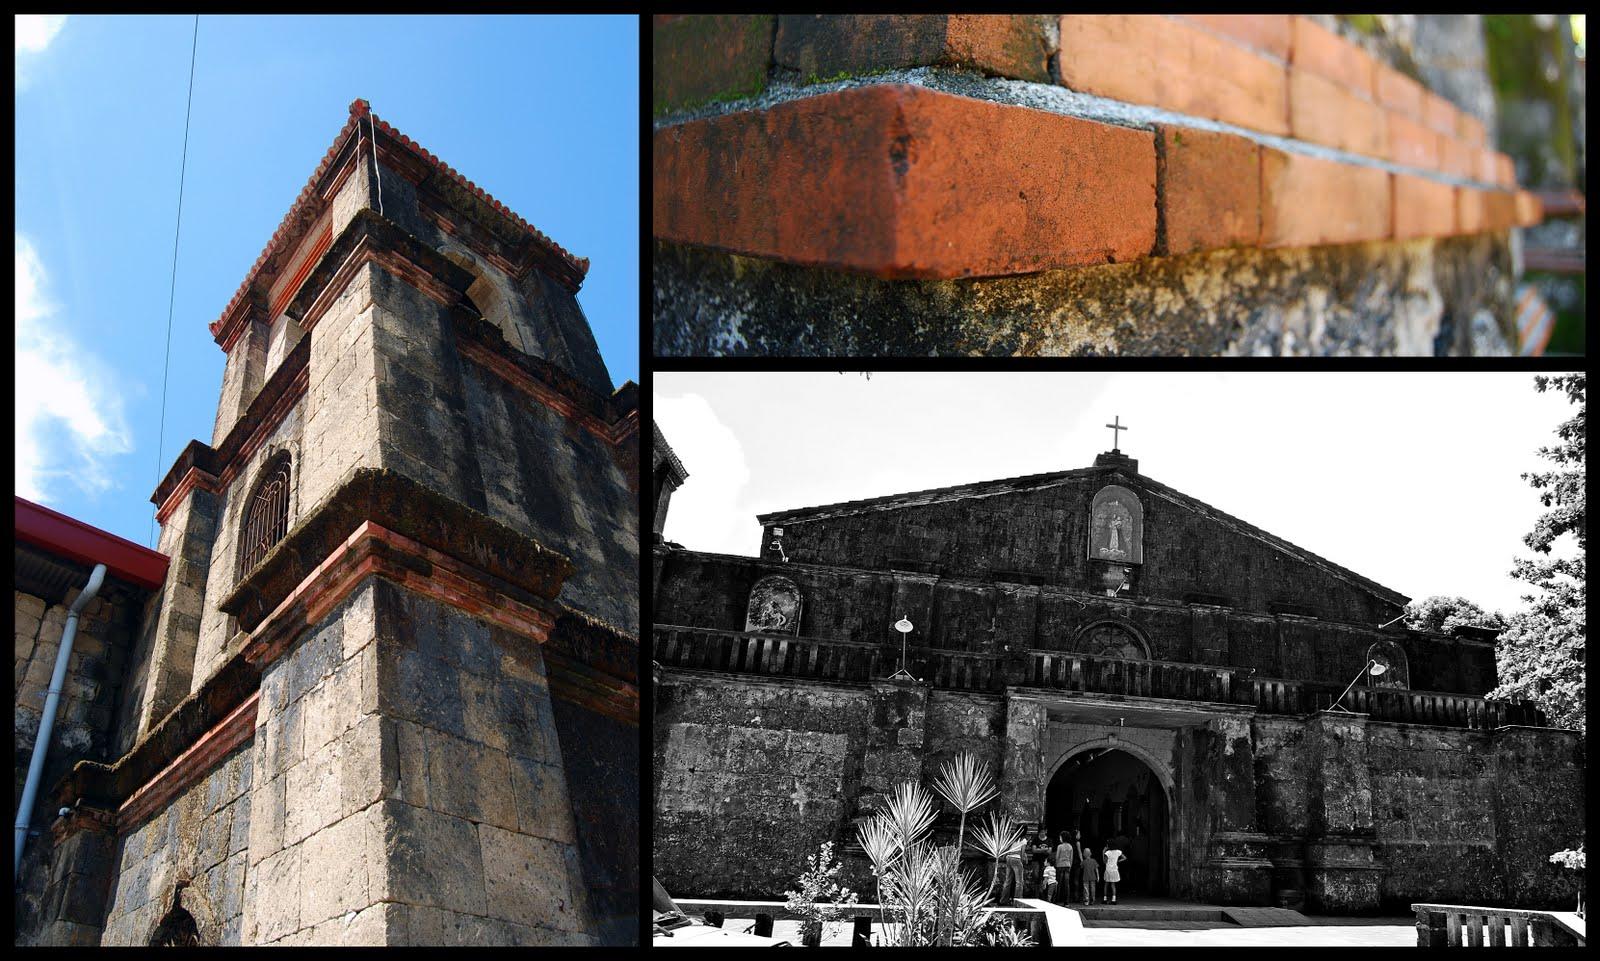 Morong Bataan Church of Pillar Church Morong